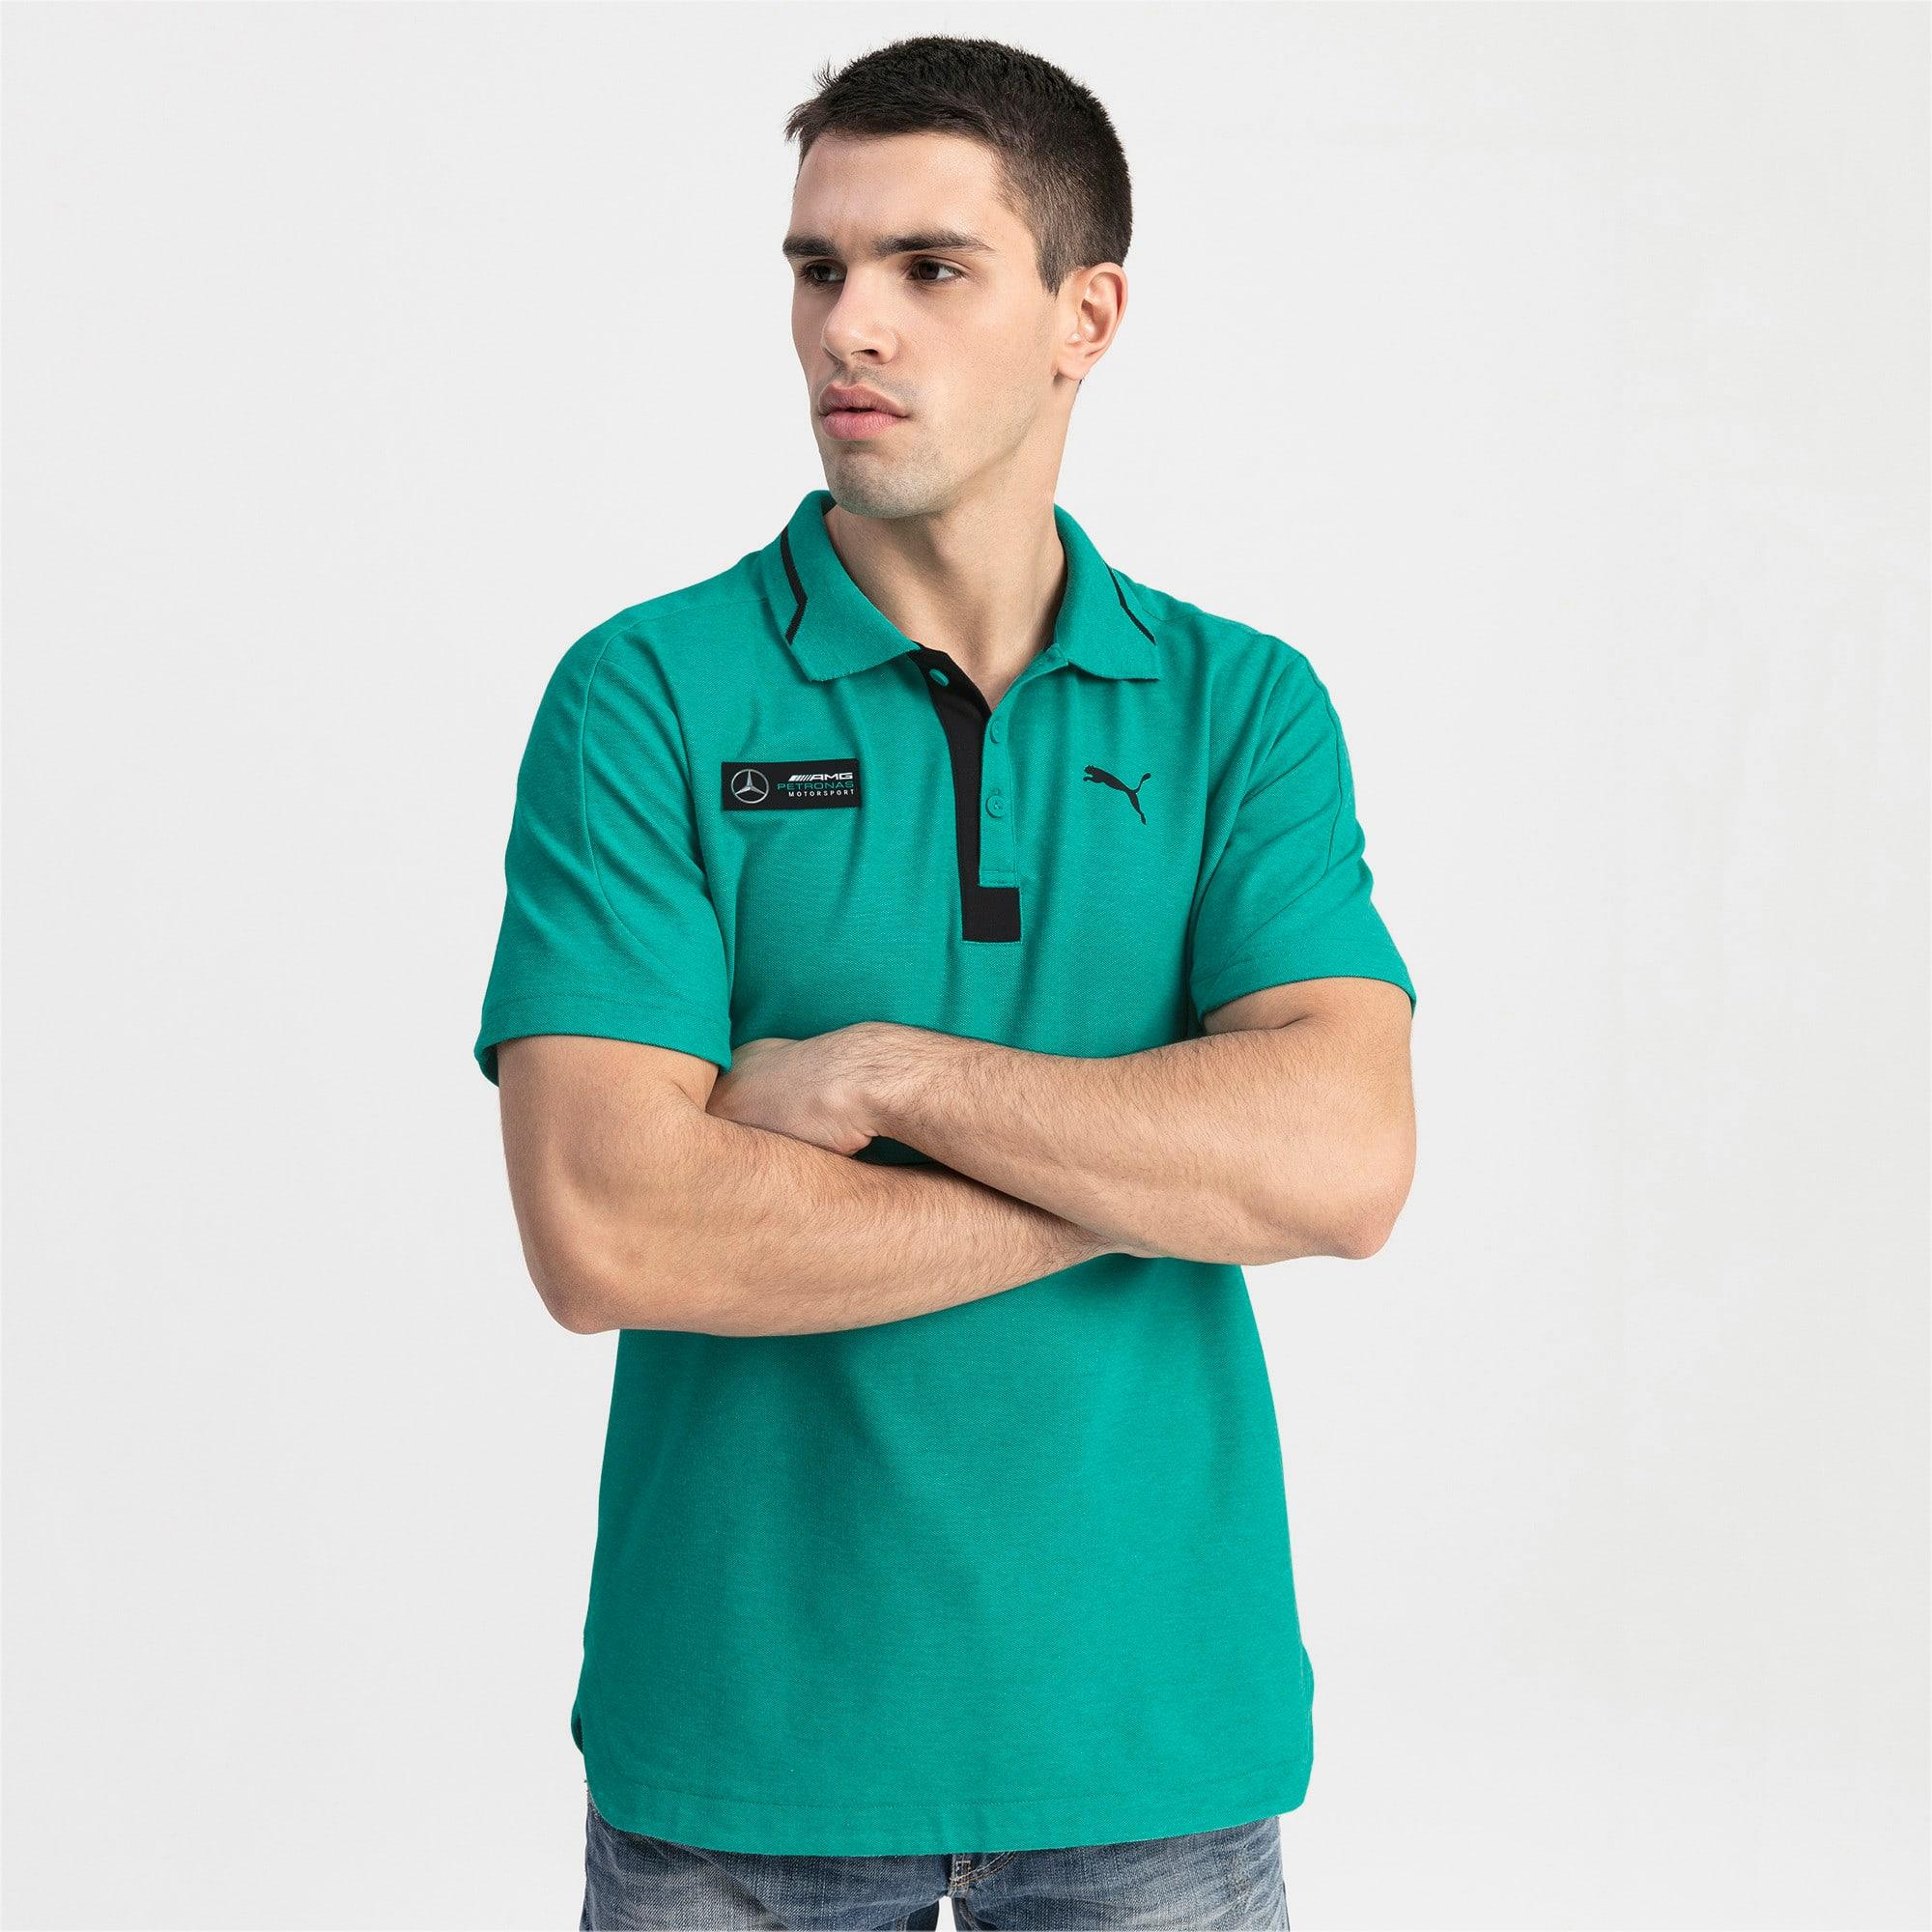 Thumbnail 1 of Mercedes AMG Petronas Men's Polo Shirt, Spectra Green Heather, medium